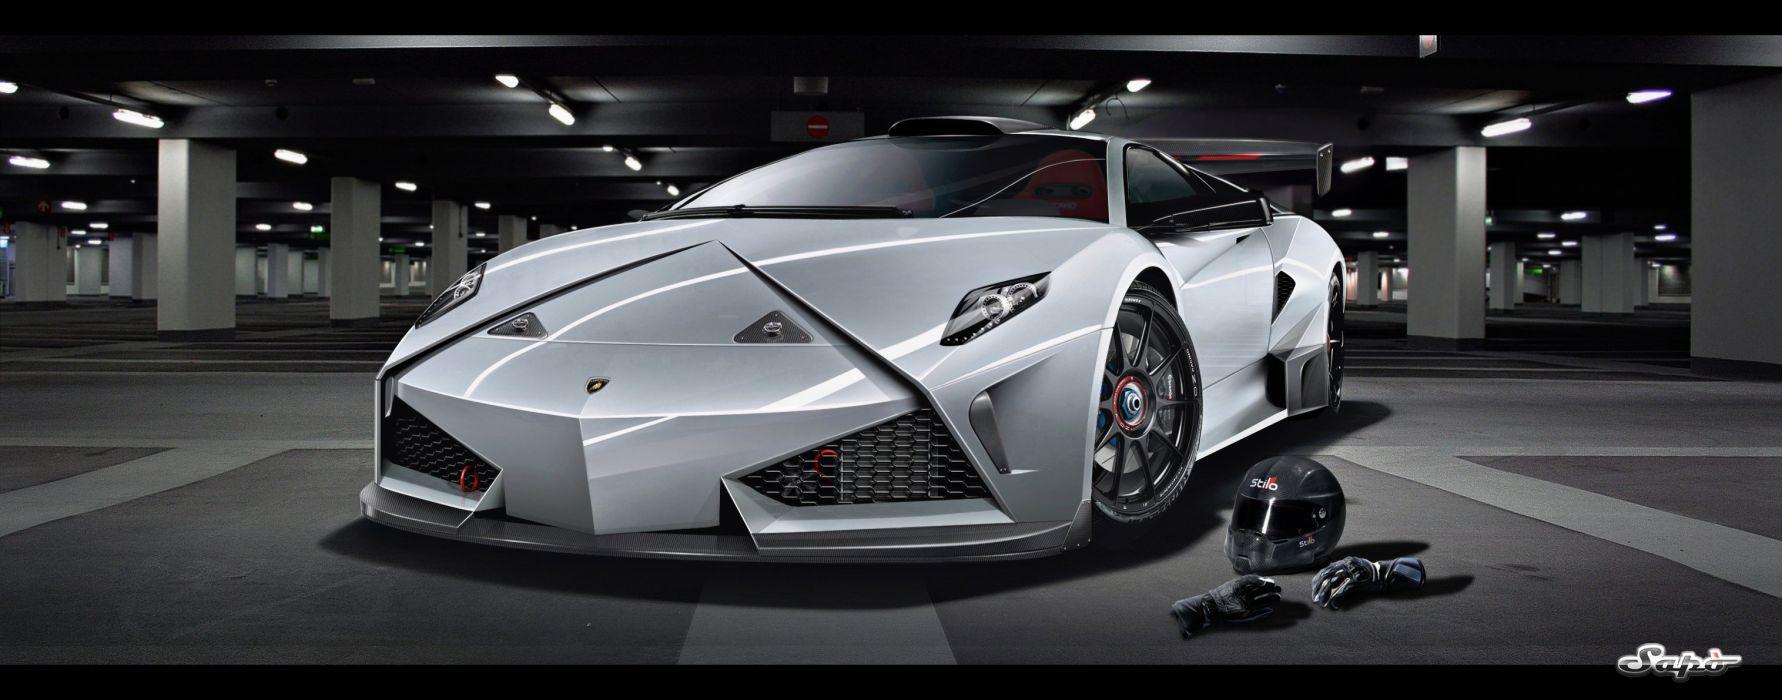 Lamborghini GTR Concept wallpaper